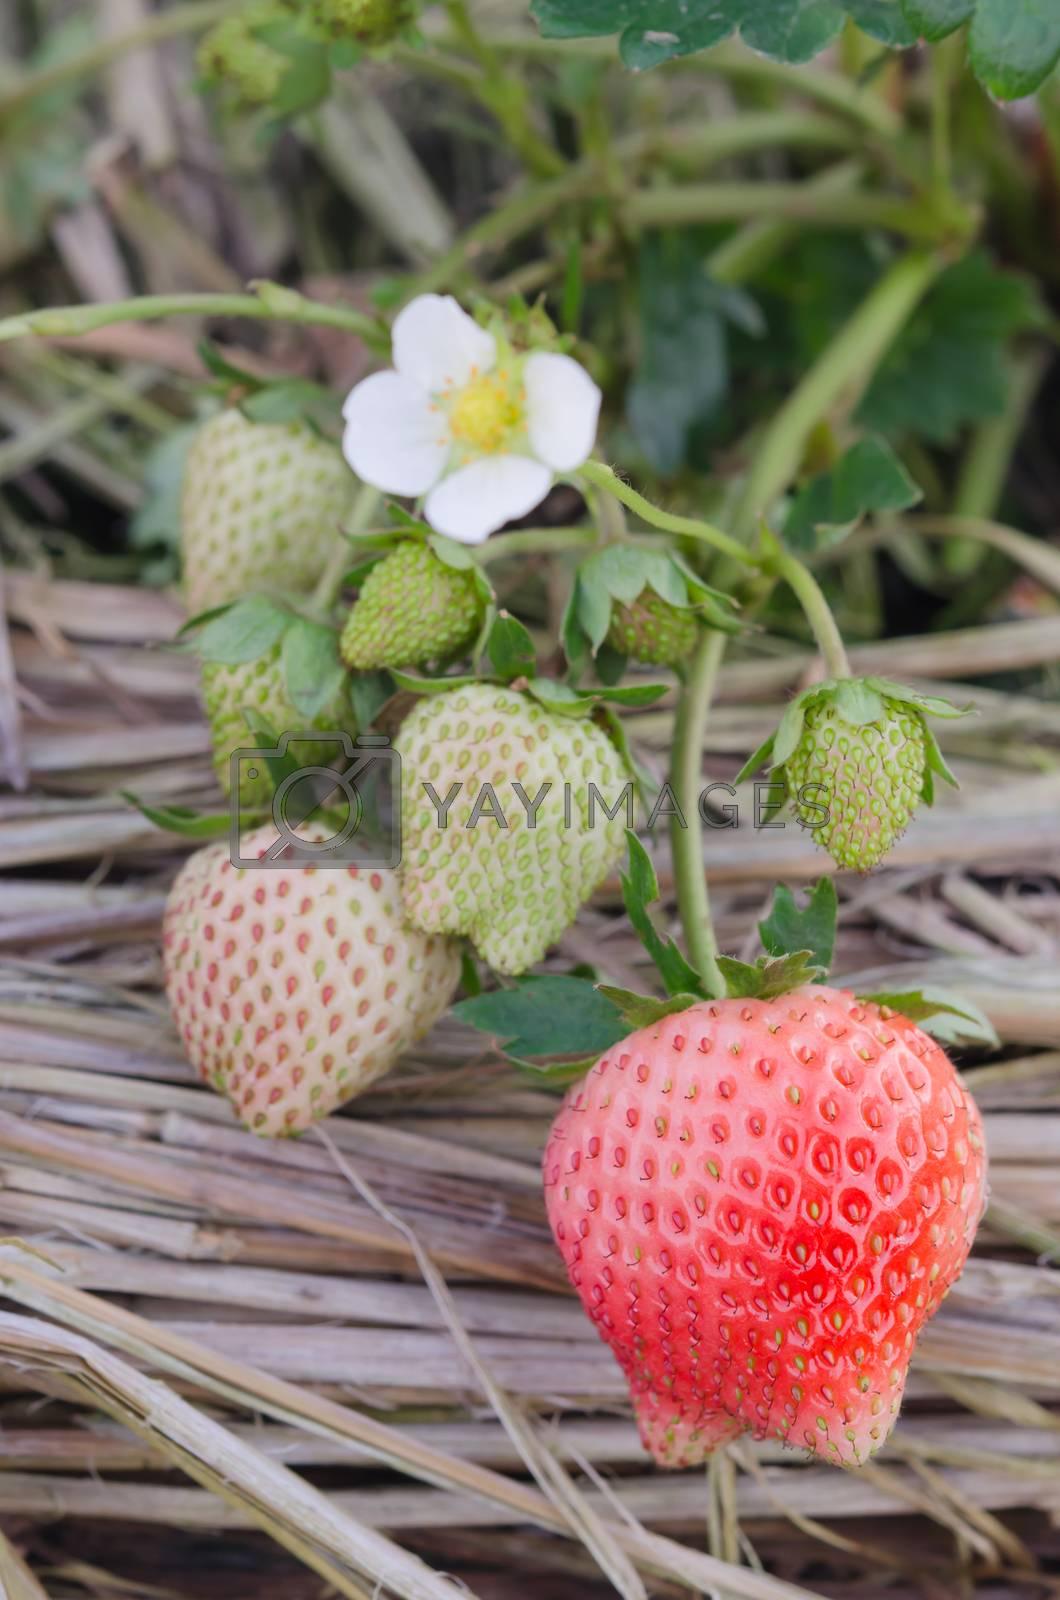 Royalty free image of Strawberry by rakratchada